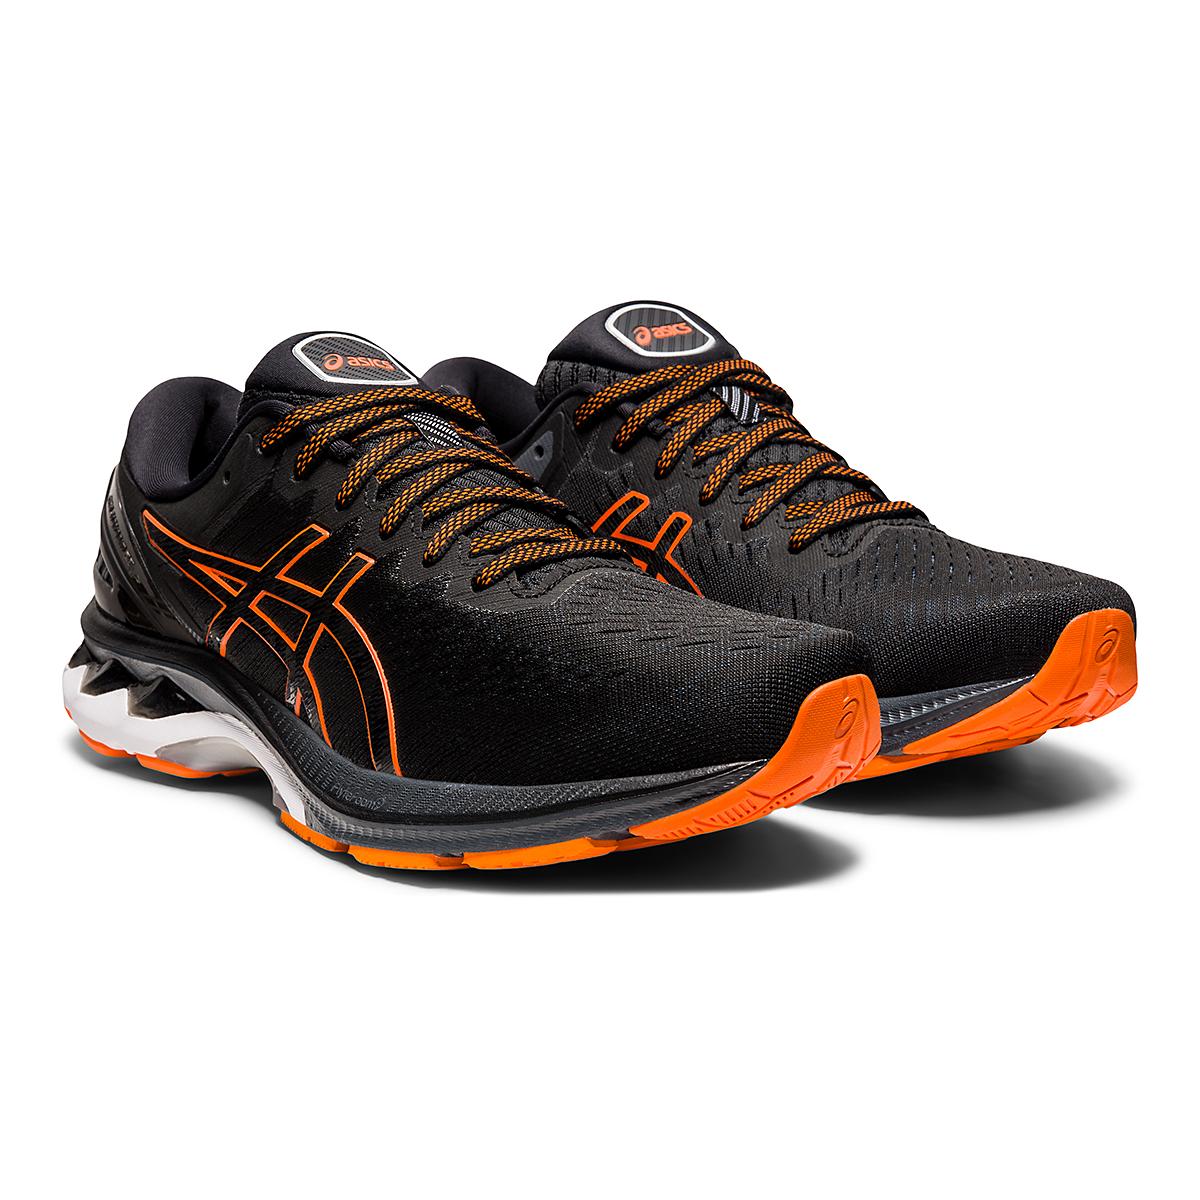 Men's Asics GEL-Kayano 27 Running Shoe - Color: Black/Marigold - Size: 7.5 - Width: Regular, Black/Marigold, large, image 3